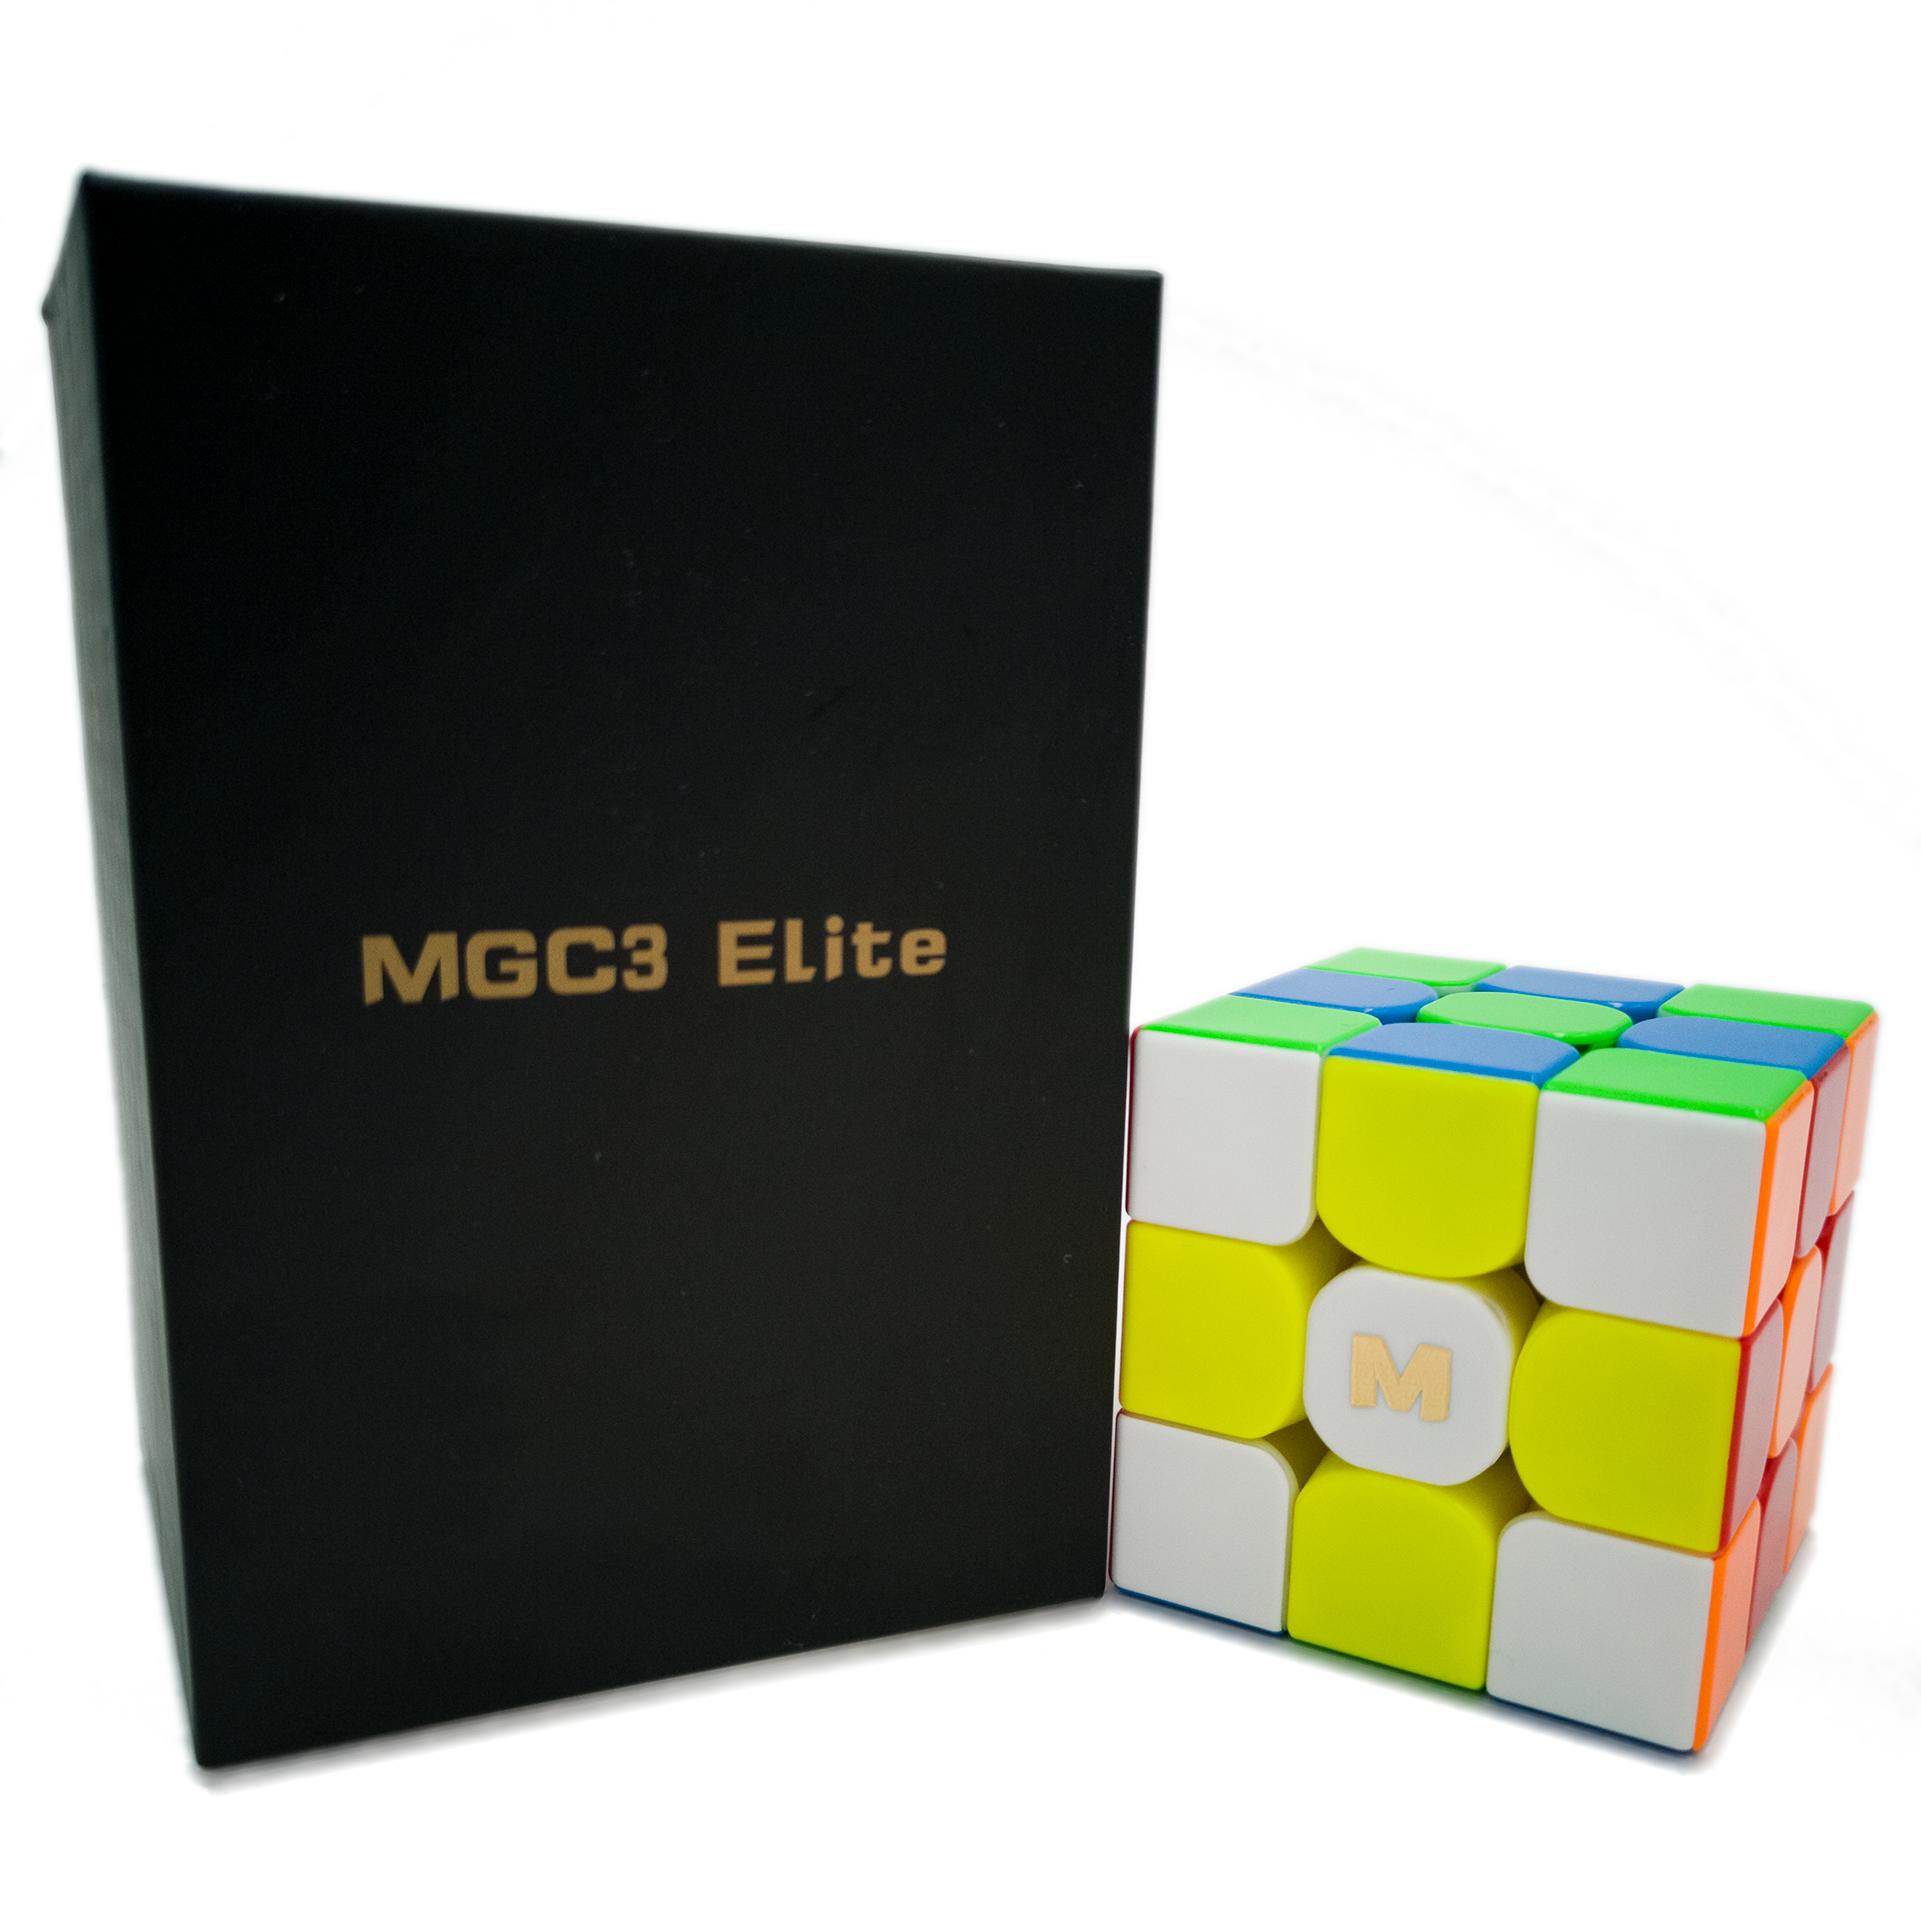 3x3x3 MGC 3 Elite